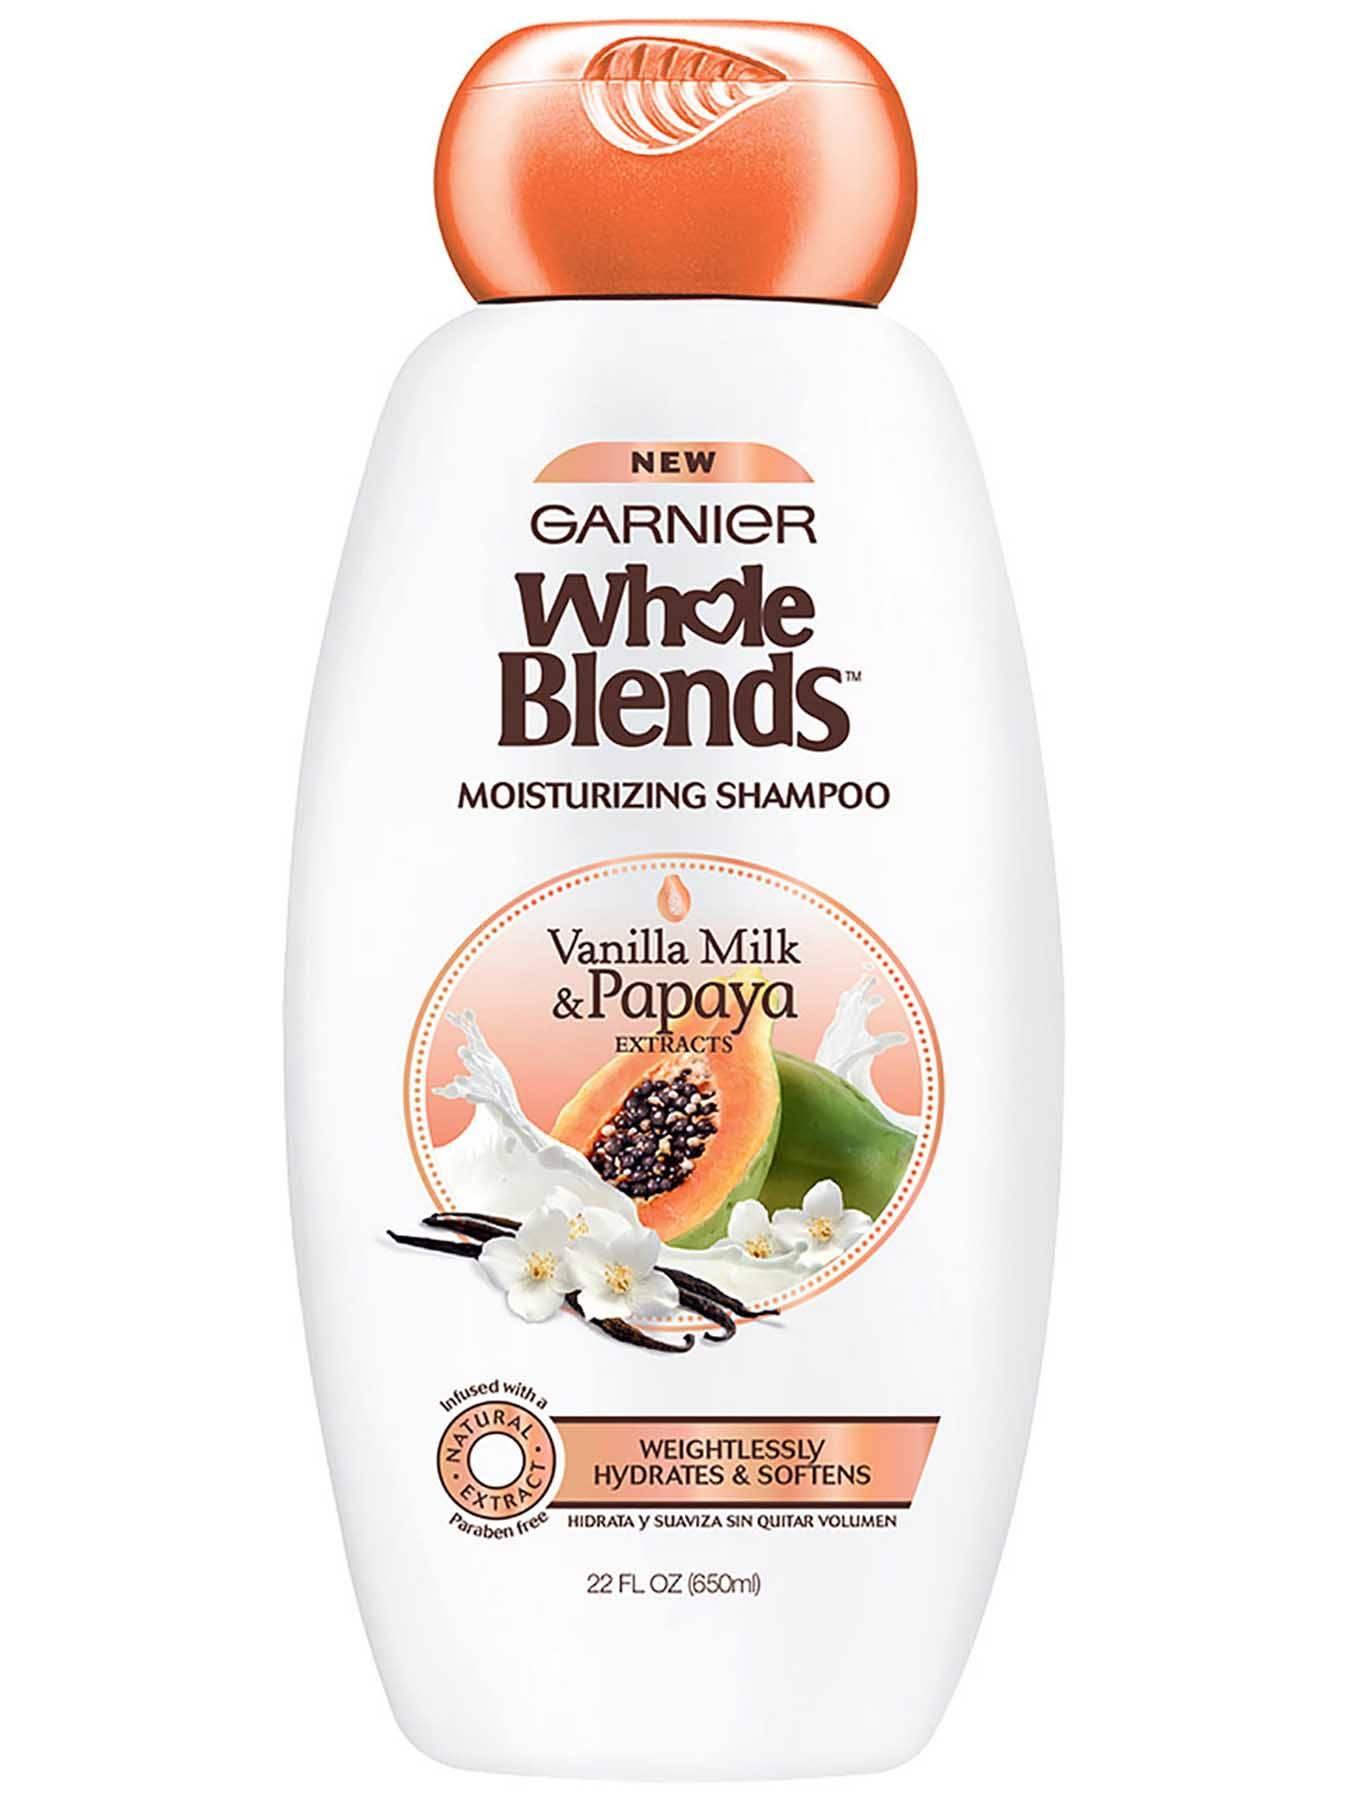 Whole Blends Vanilla Milk Amp Papaya Moisturizing Shampoo